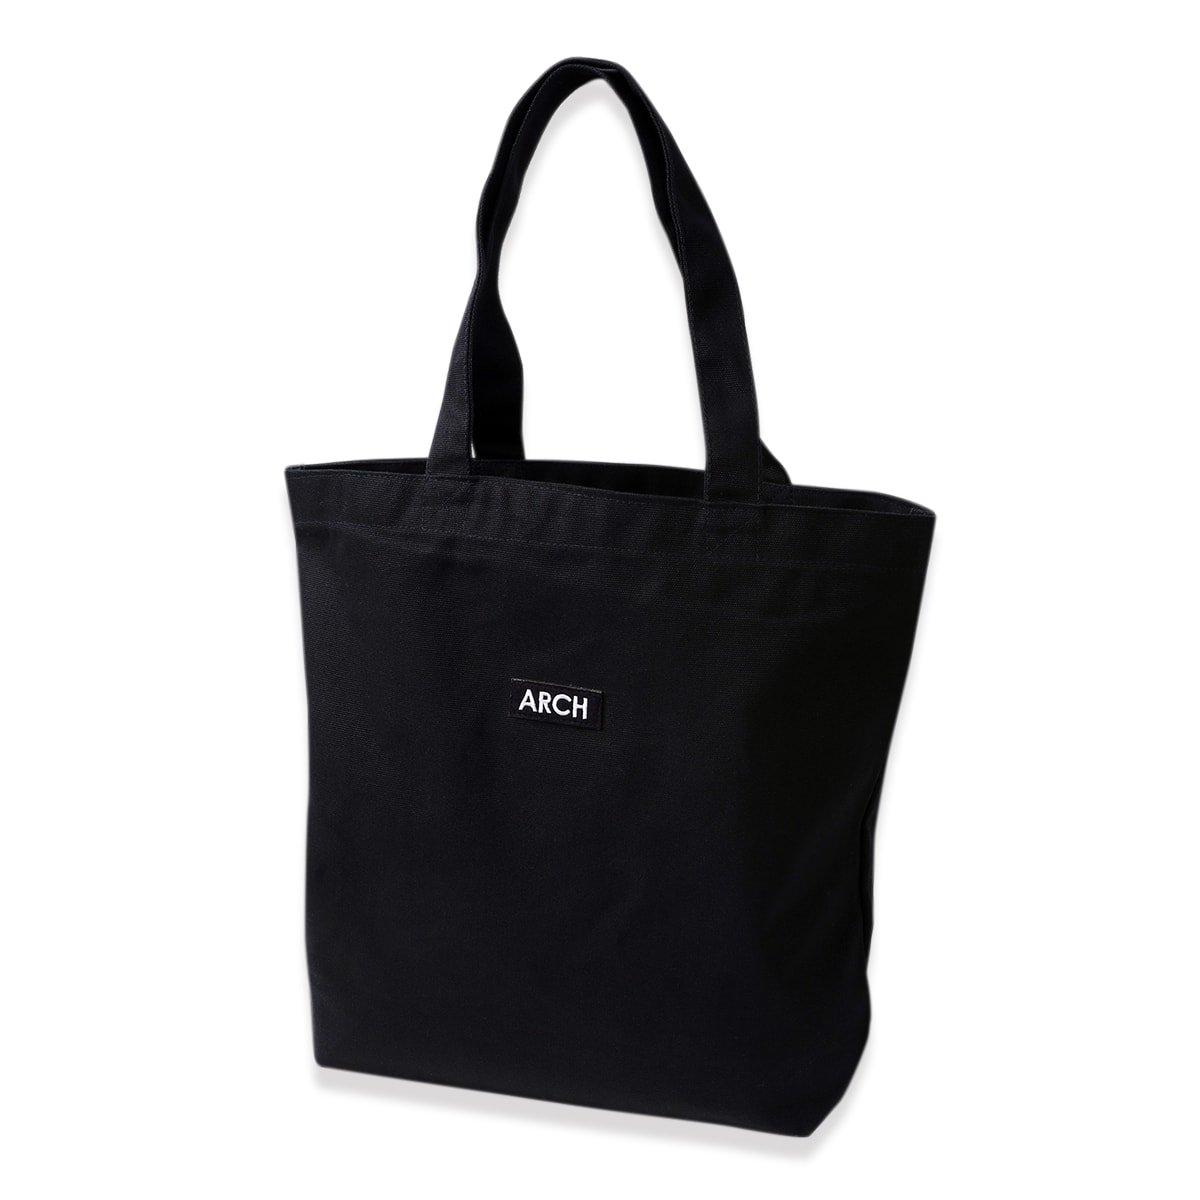 patched tote bag[medium]【black】